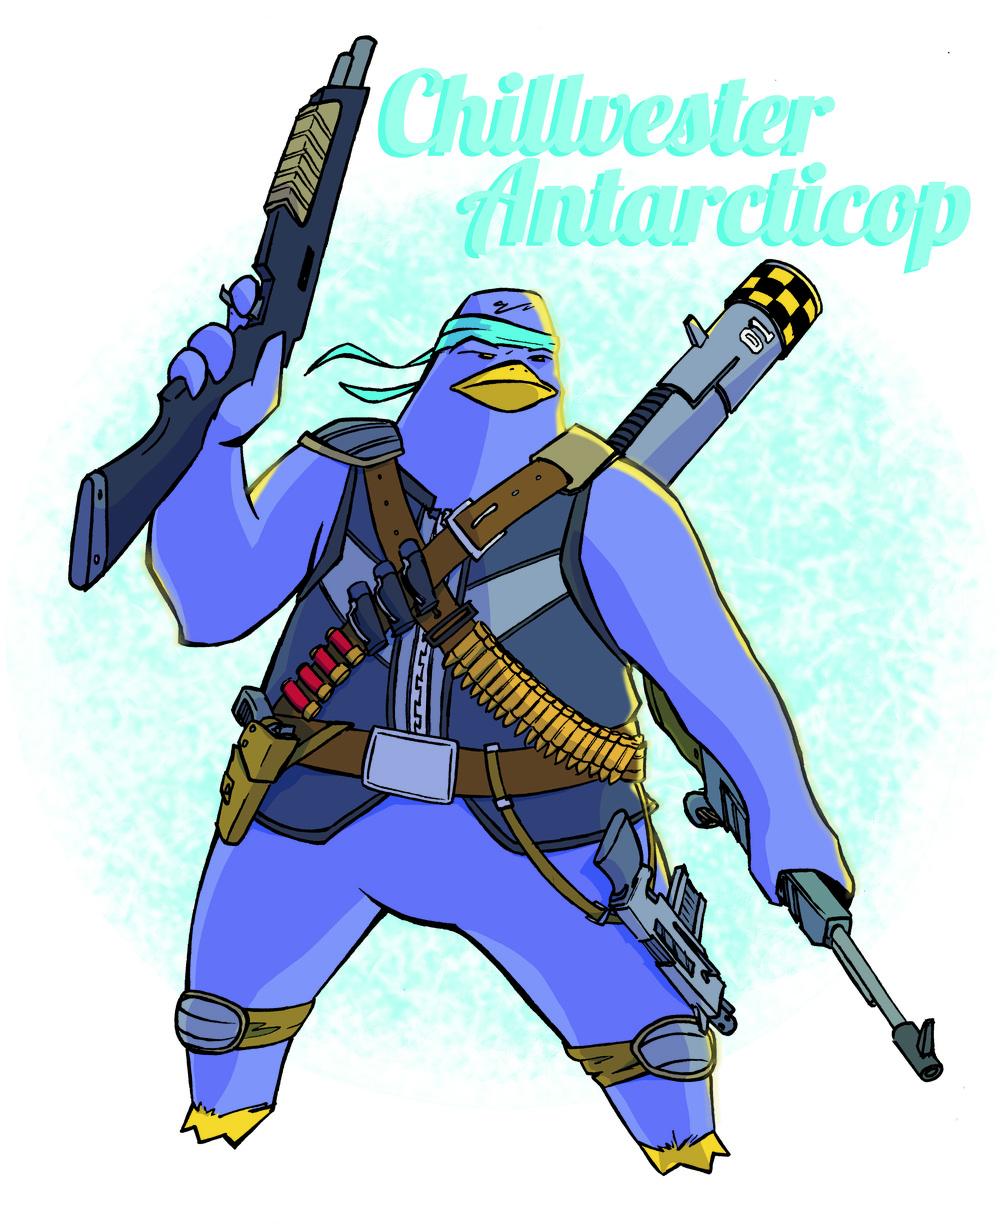 Chillvester Antarcticop